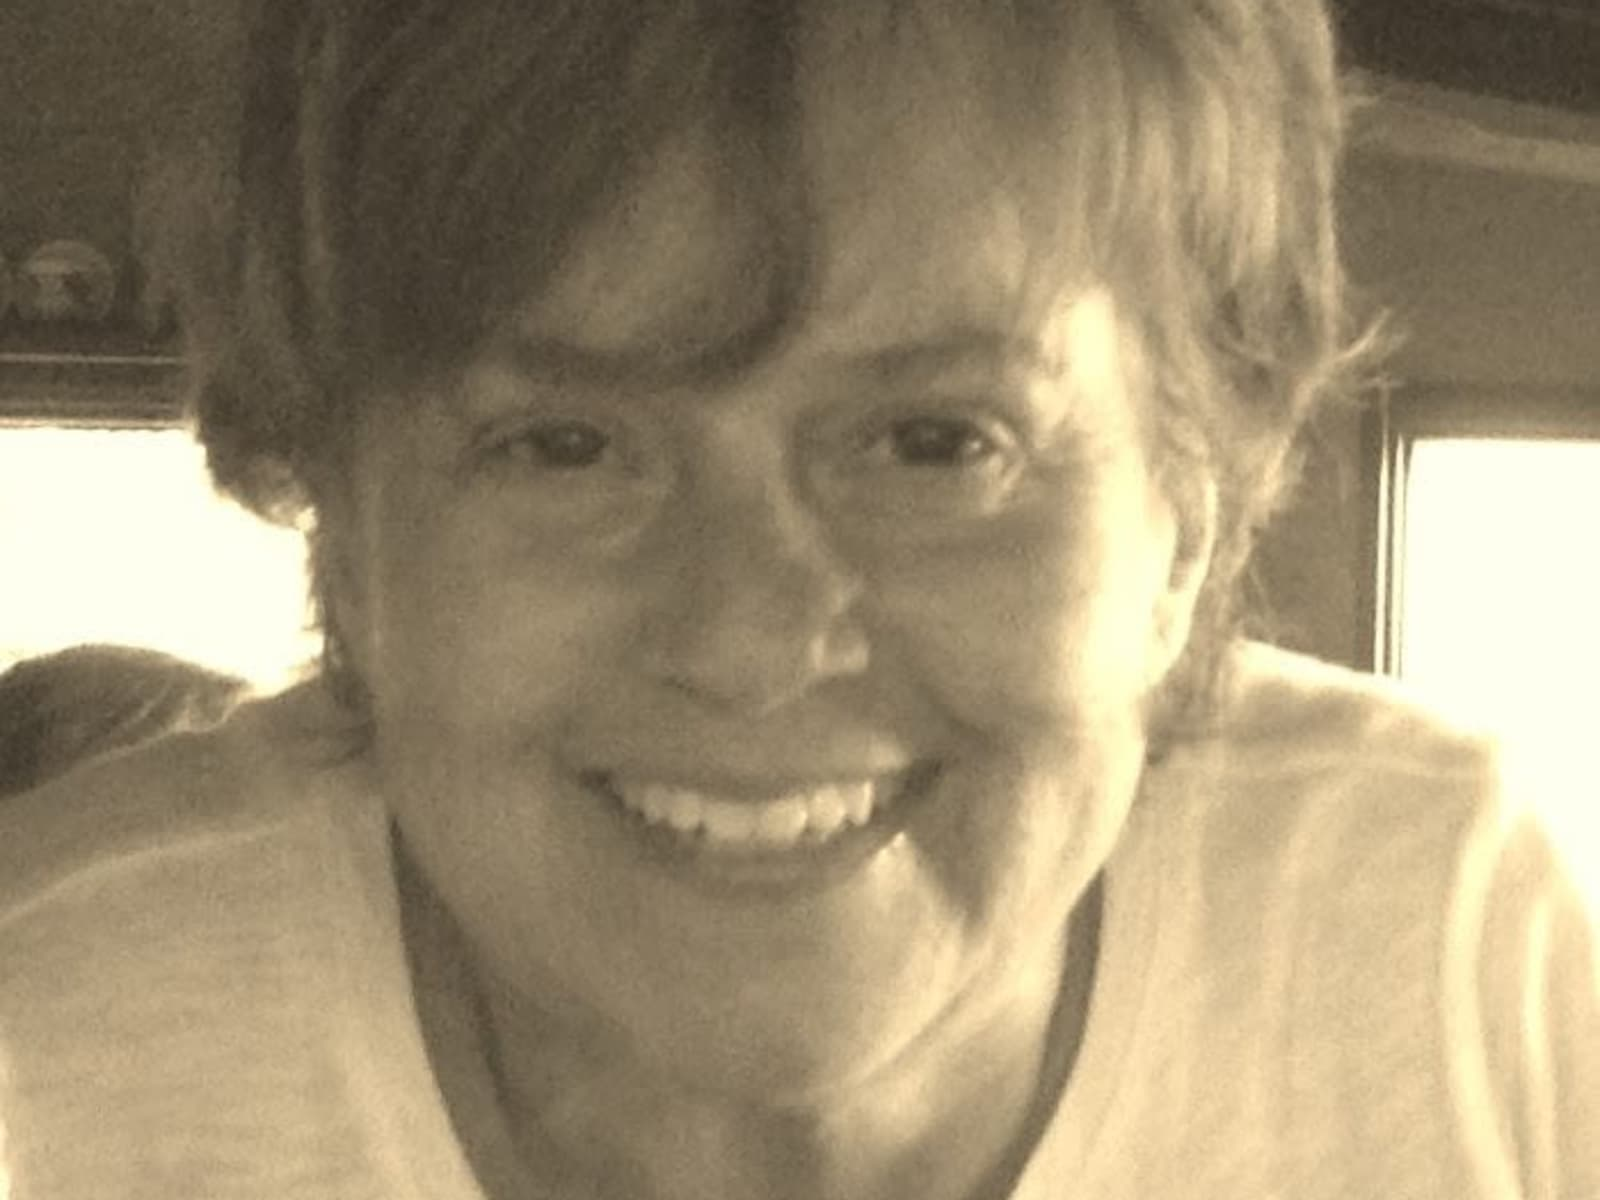 Janice from Indianapolis, Indiana, United States